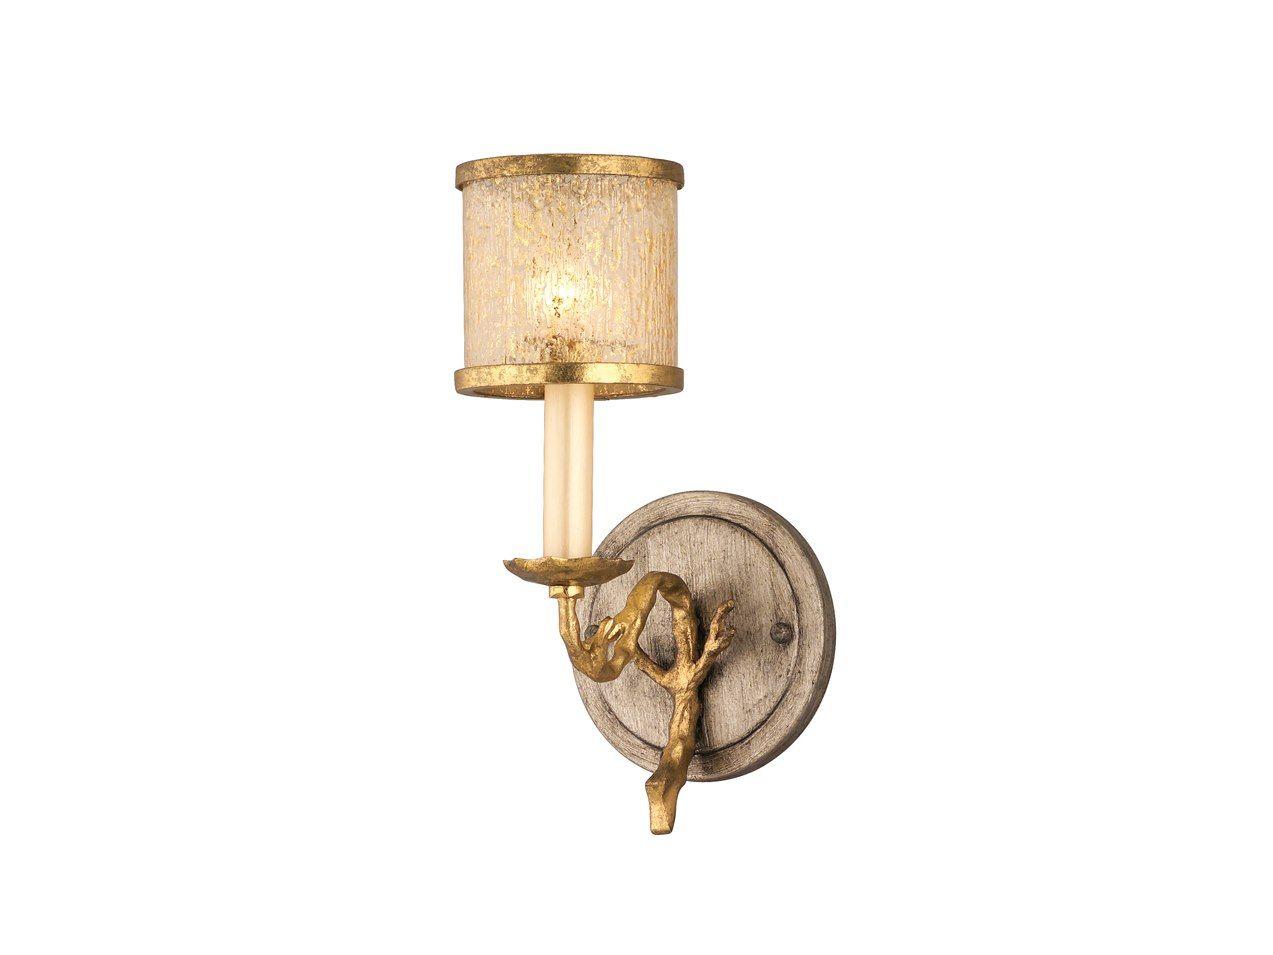 luxury lighting direct. Corbett Lighting Parc Royale Gold And Silver Leaf Bath Light Luxury Direct F